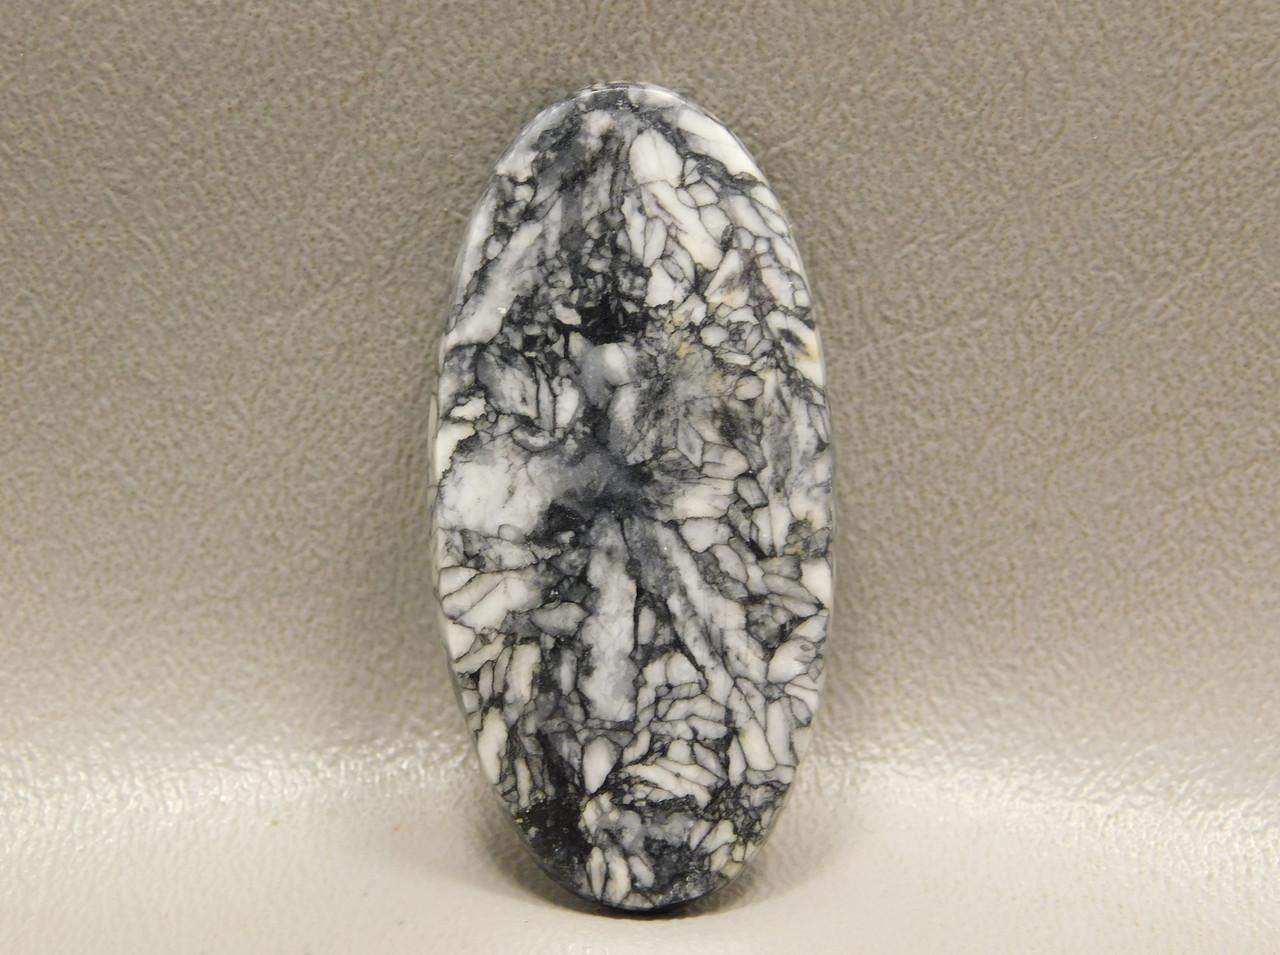 Pinolith or Pinolite Jewelry Stone Cabochon #11